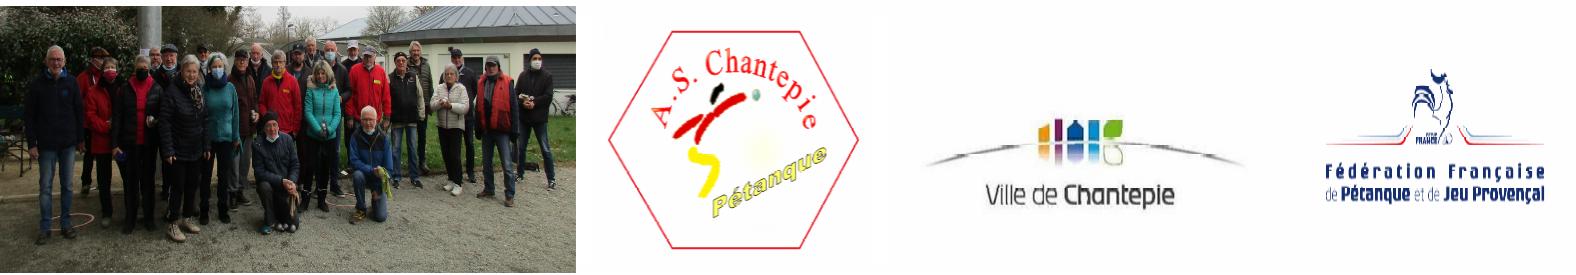 A.S. CHANTEPIE PETANQUE